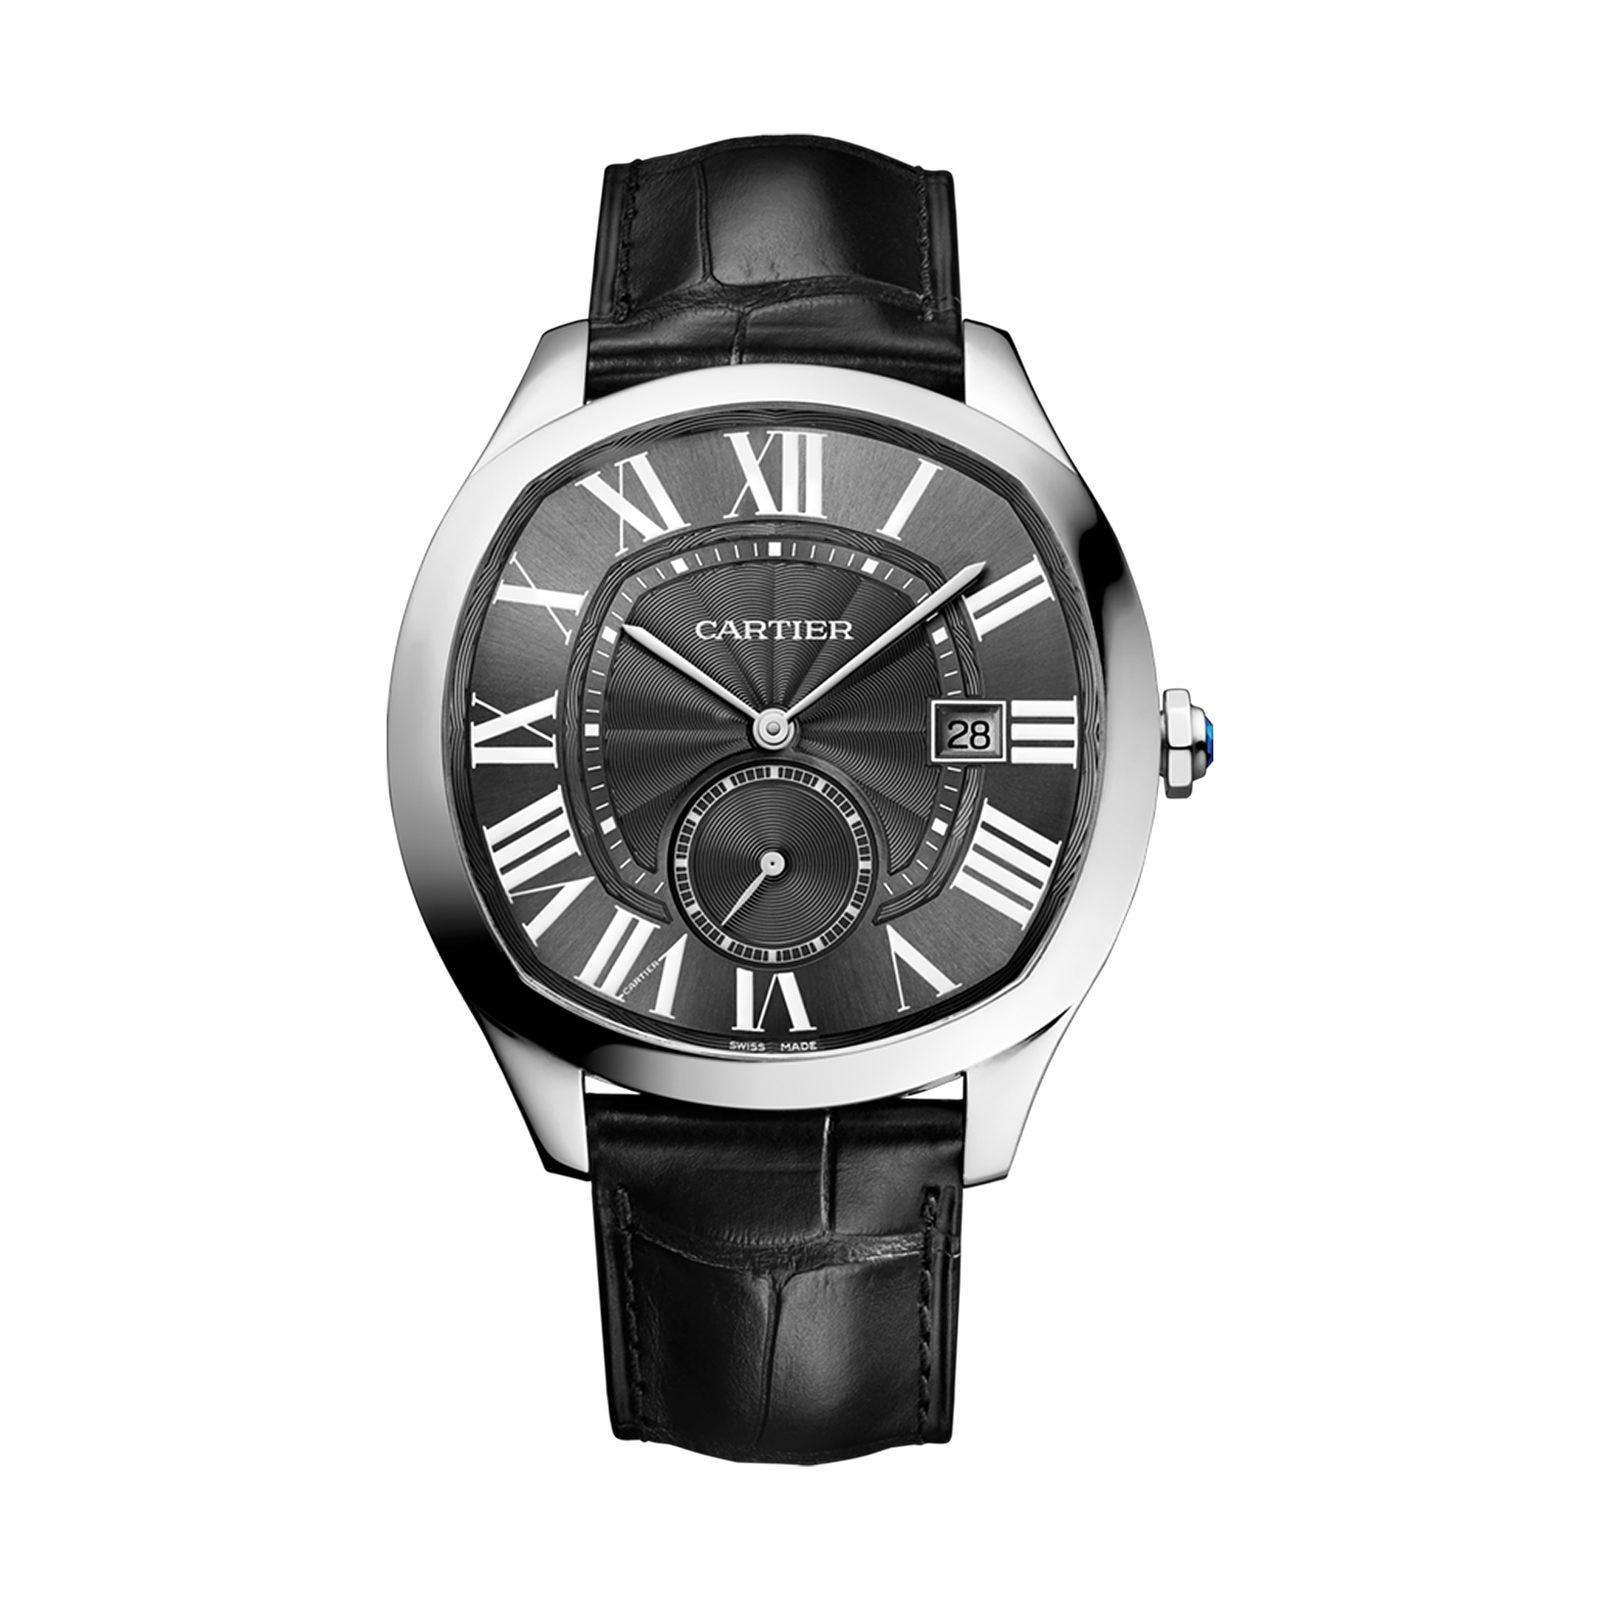 Cartier Drive de Cartier watch, Steel, leather